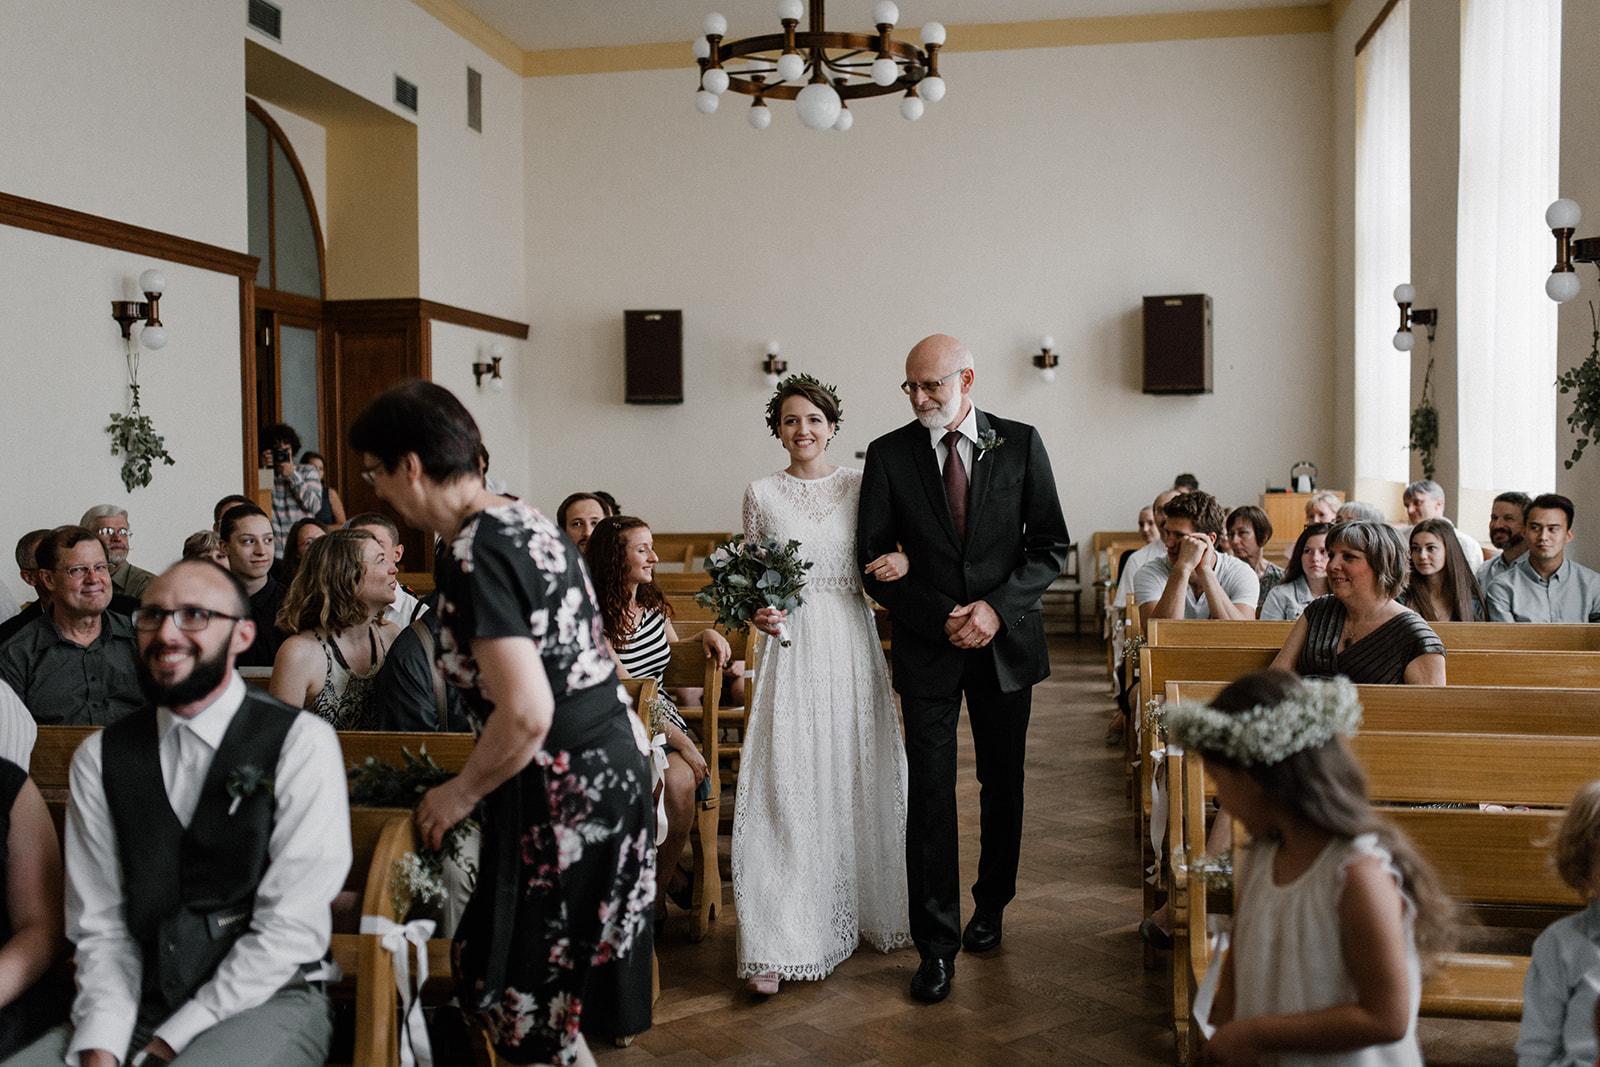 Jaja_Josh_wedding-160.jpg